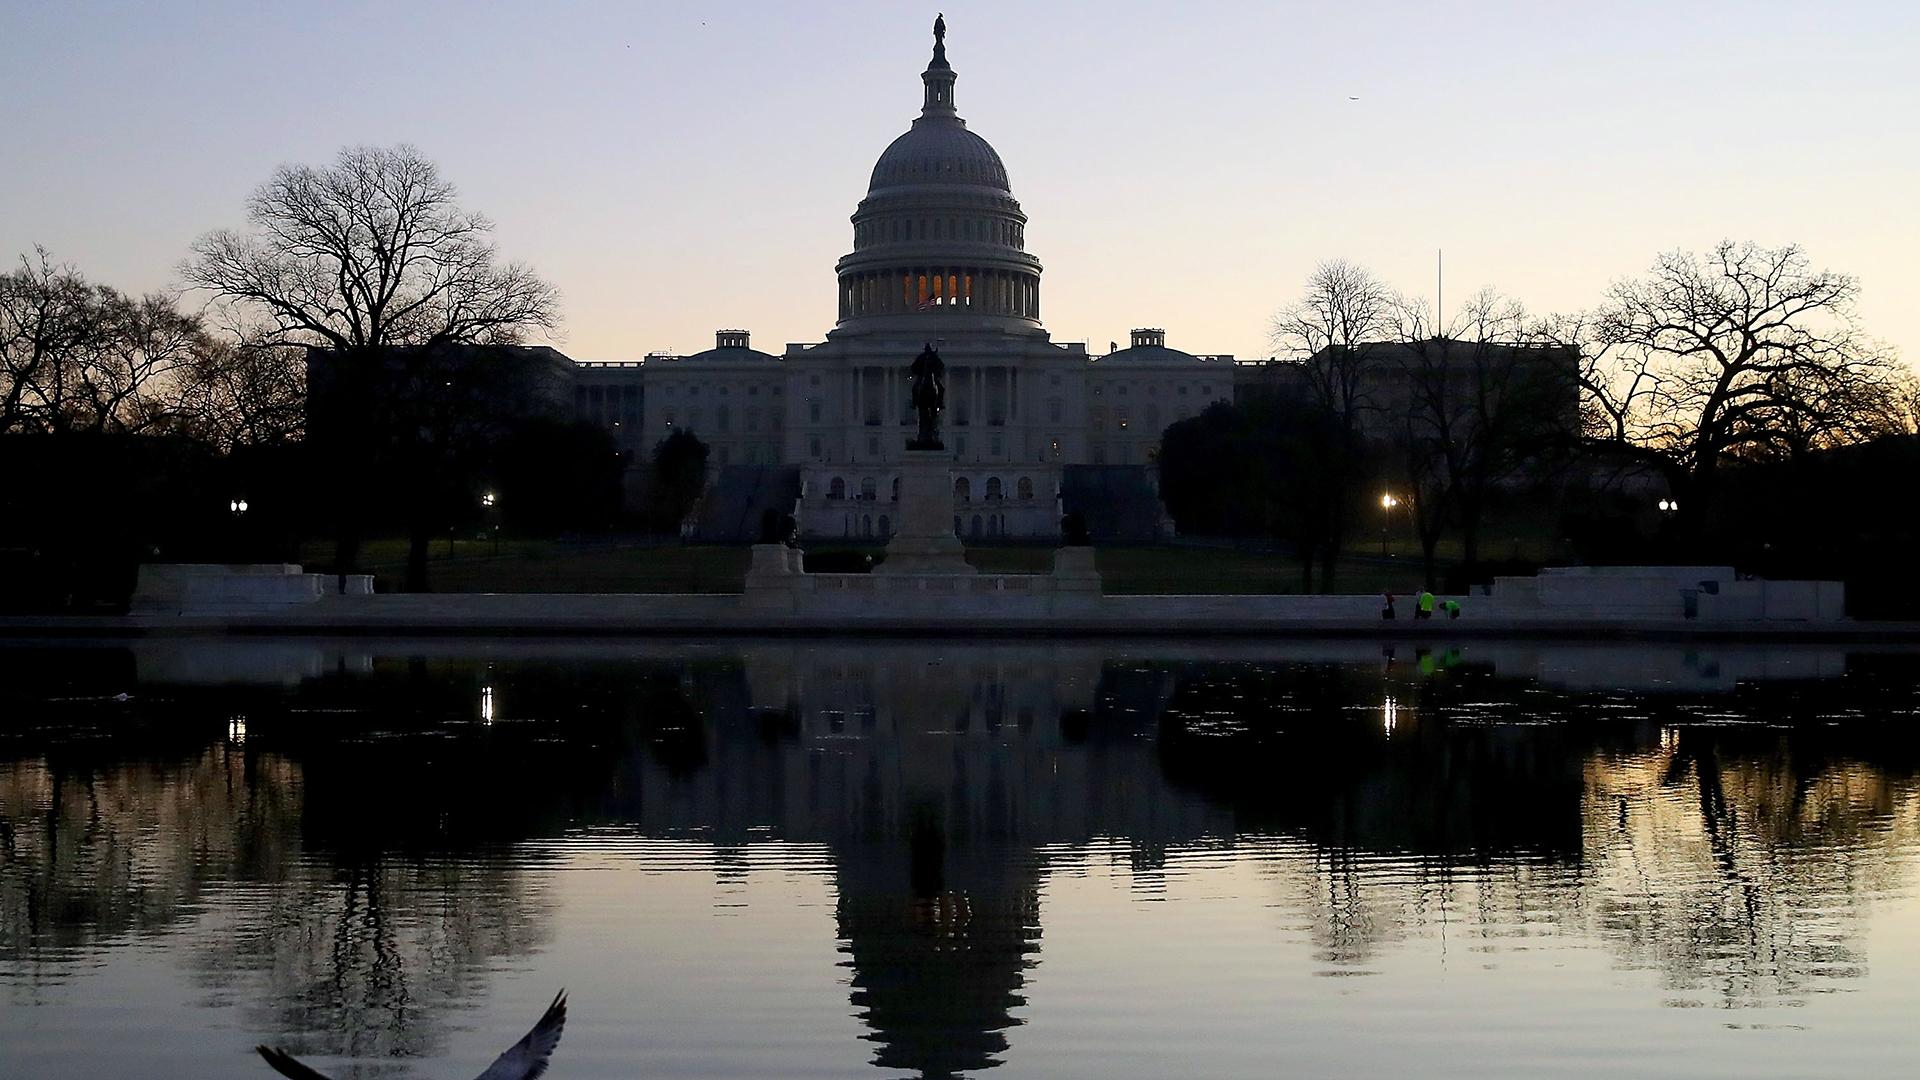 US Capitol reflection pond-159532.jpg21378383